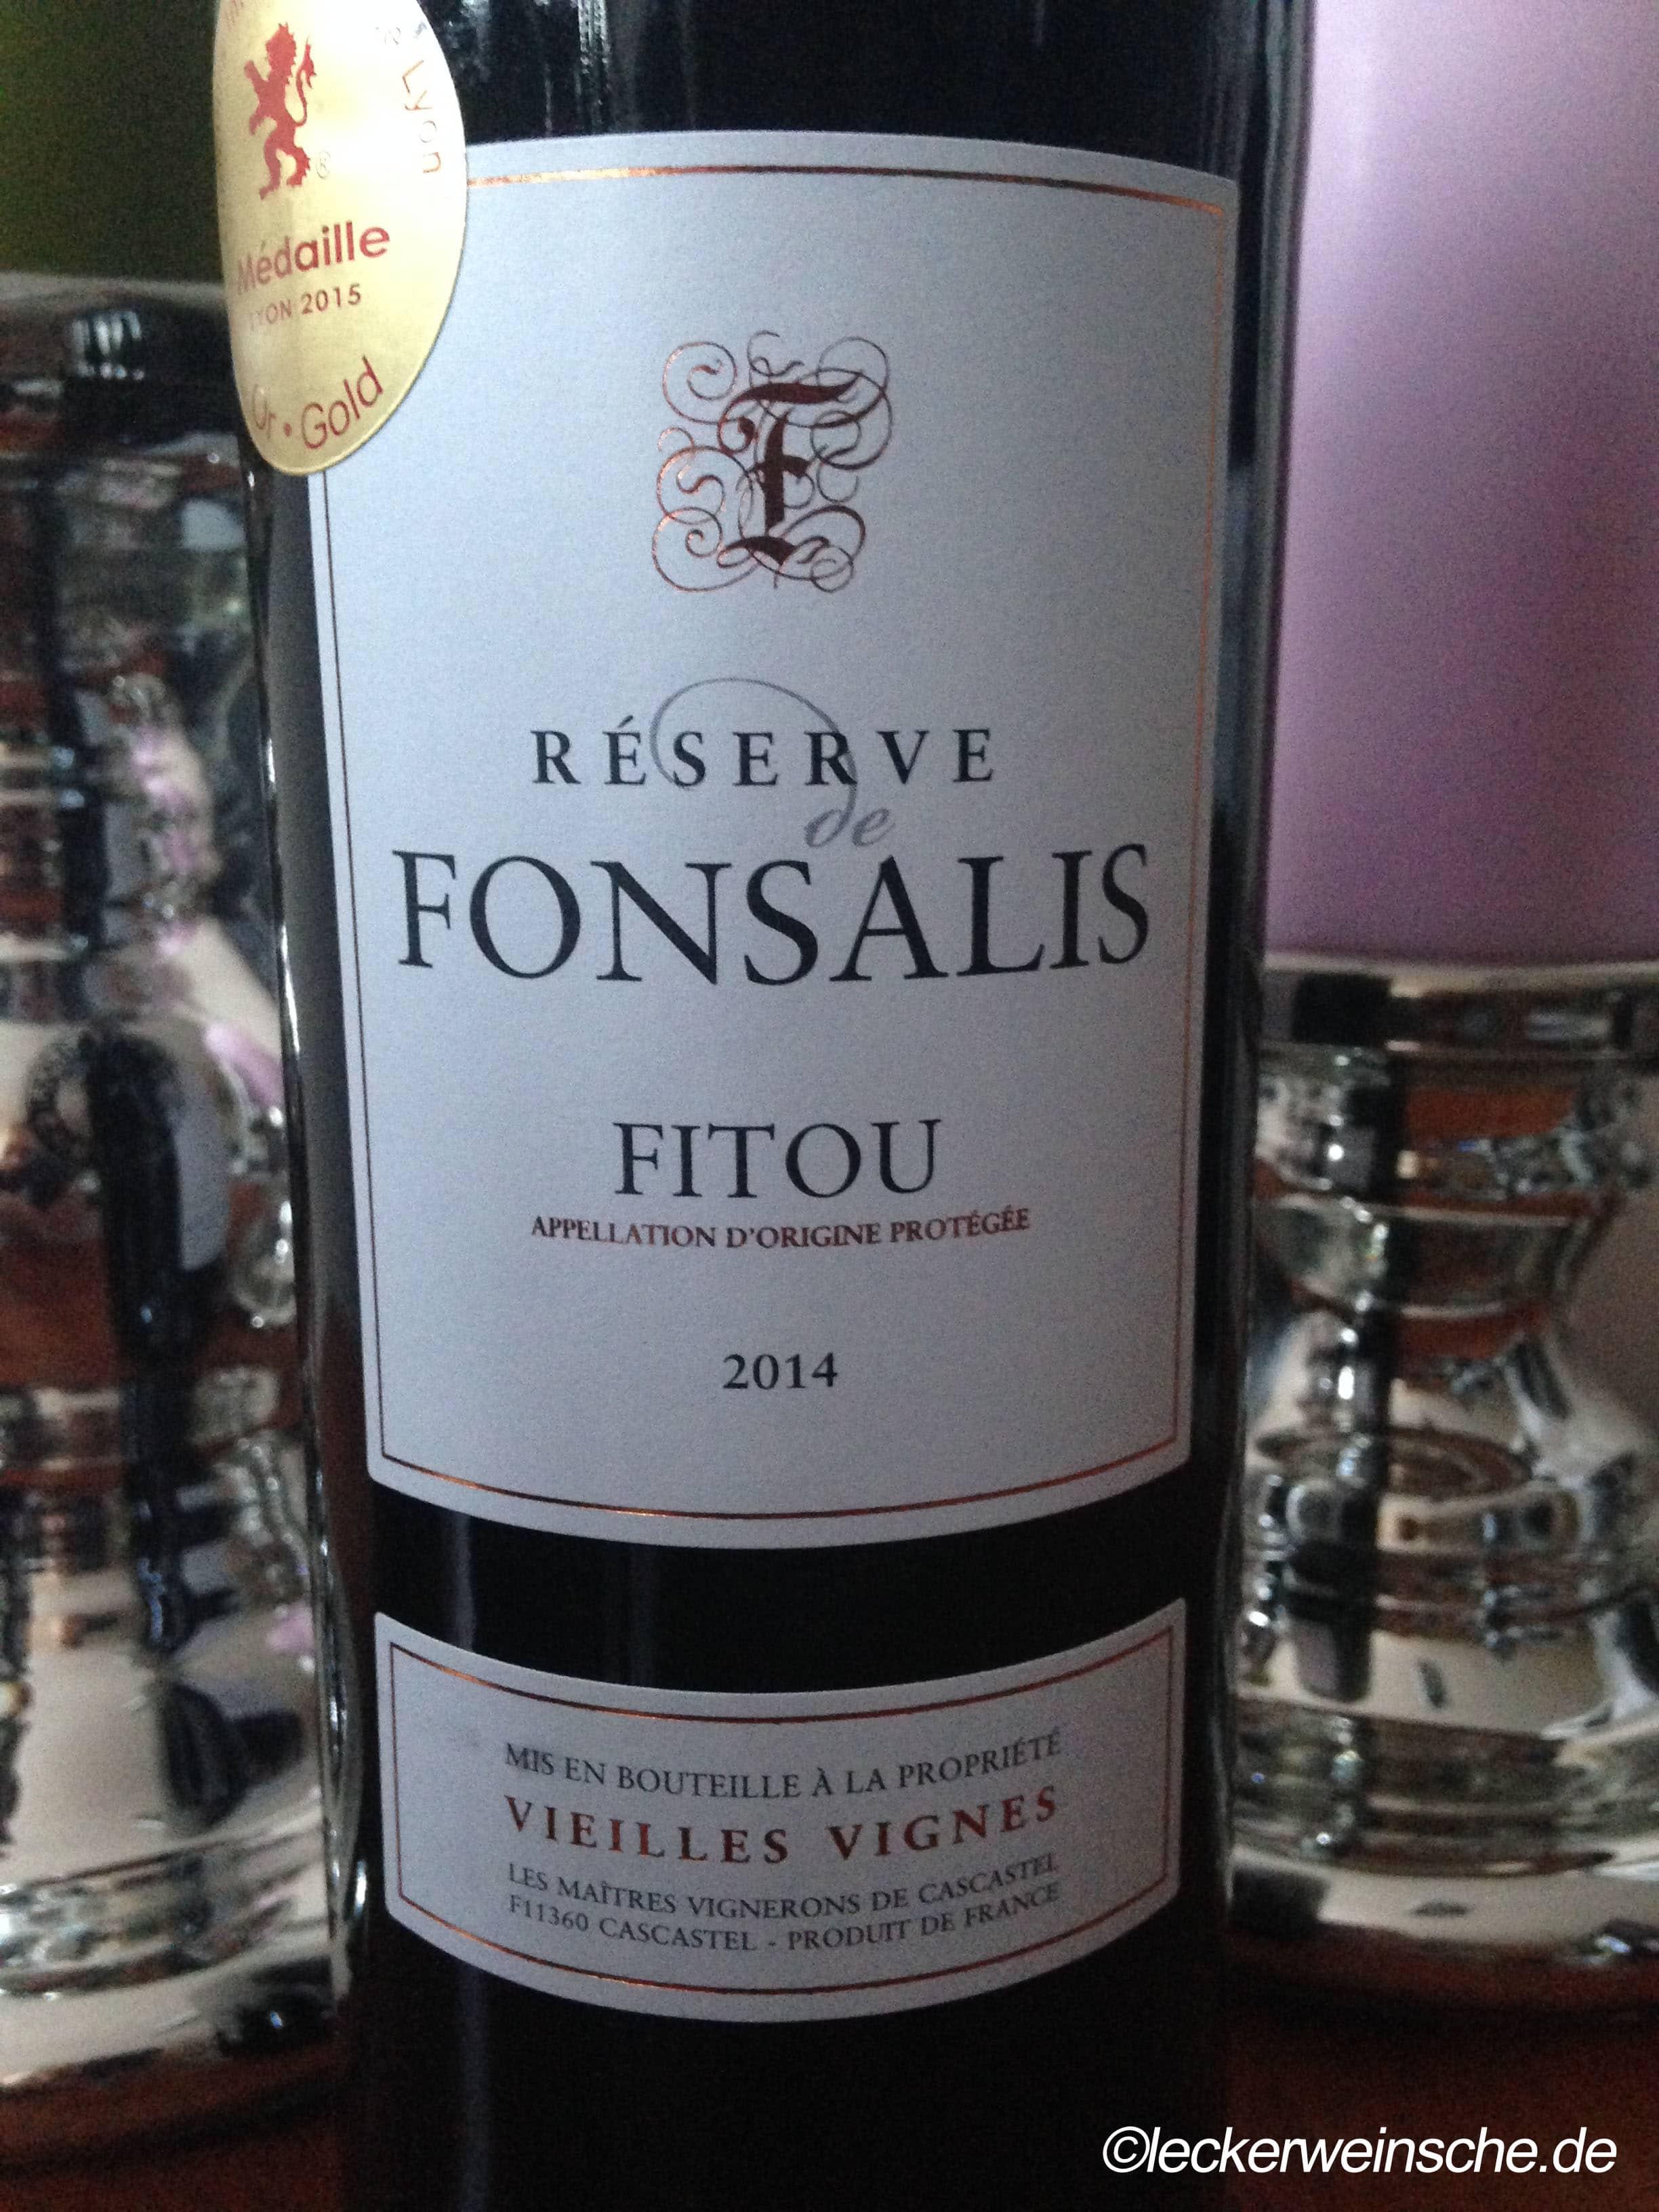 reserve_fonsalis_fitou